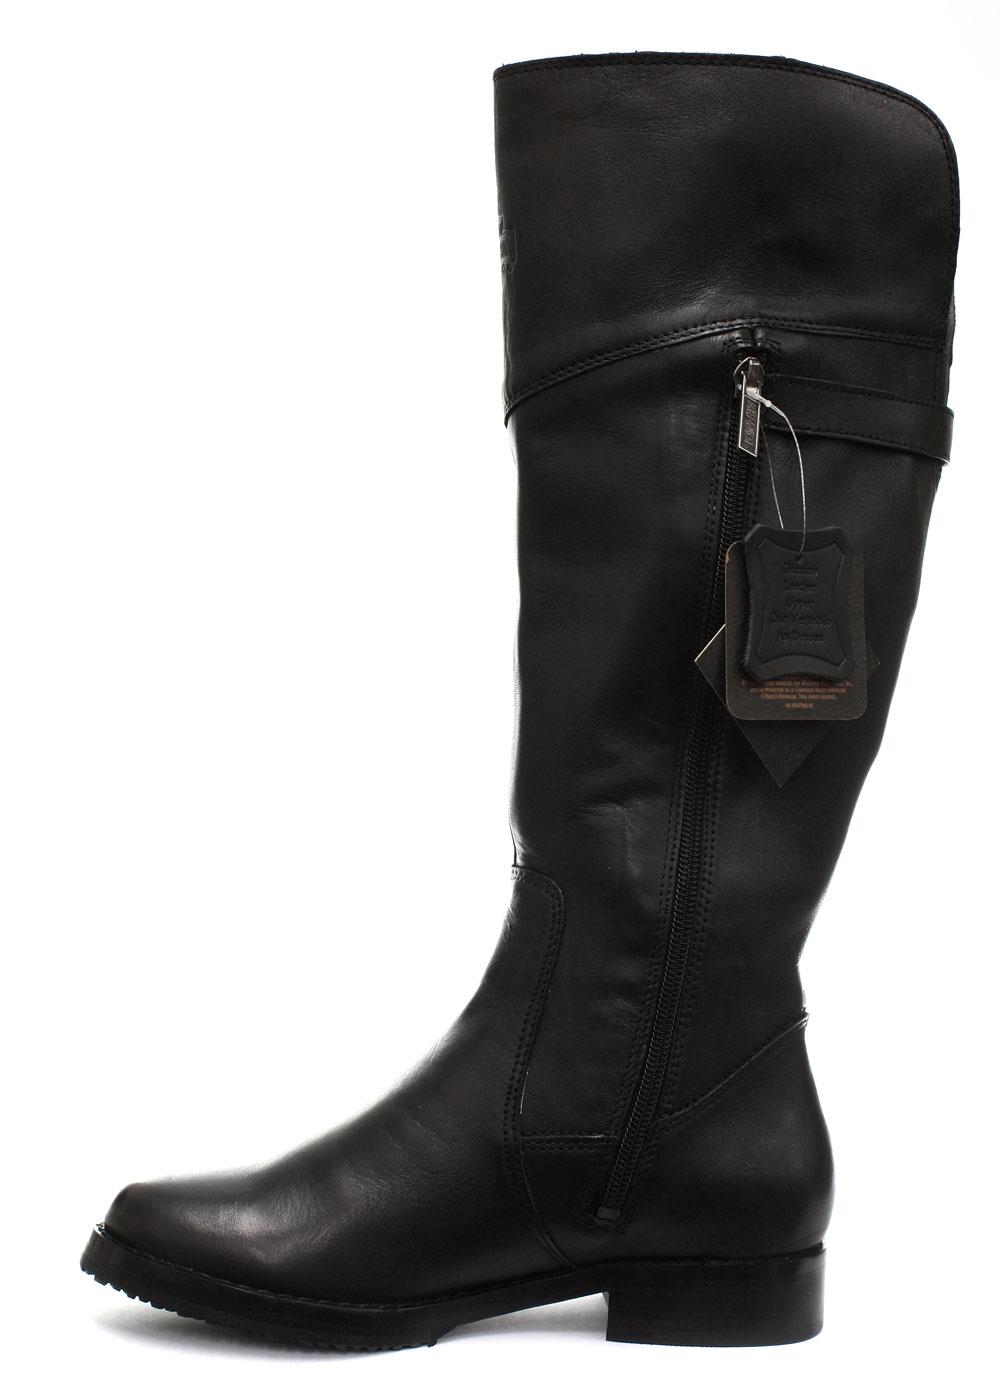 new harley davidson womens boots all sizes ebay